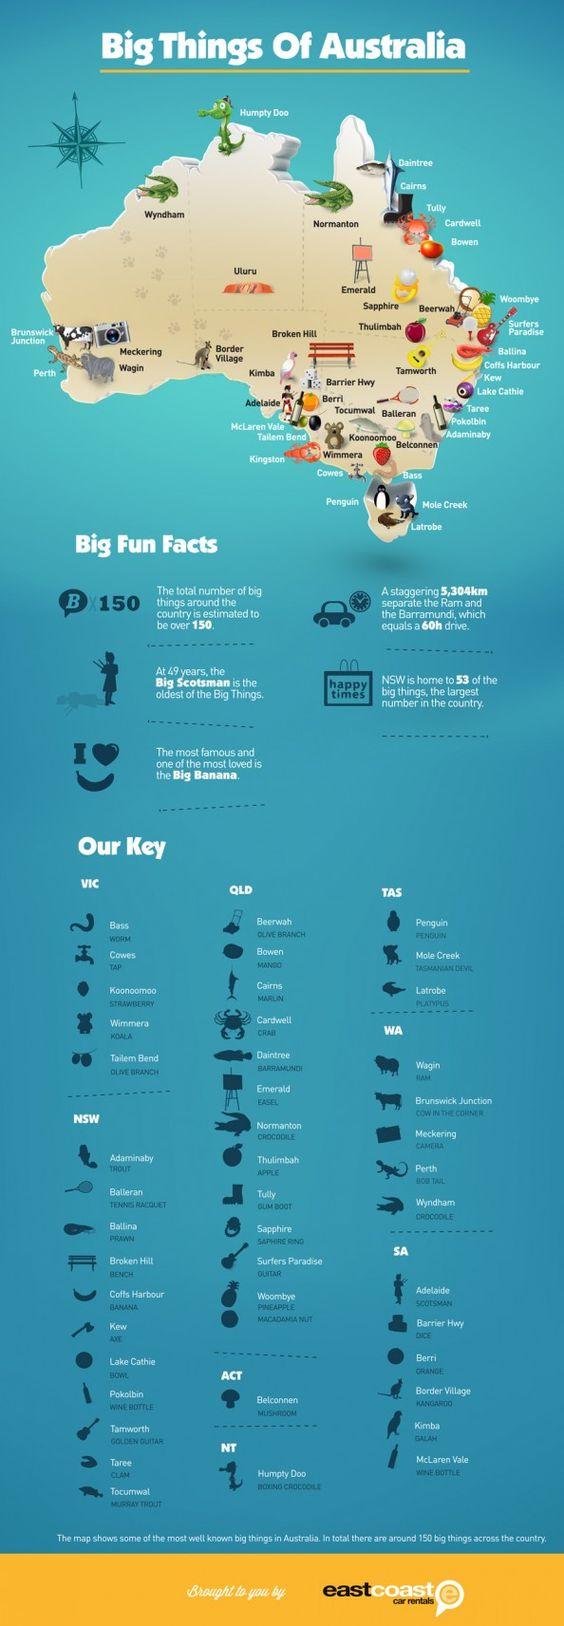 Big Things of Australia Map Infographic Australian culture – Explore Australia Map